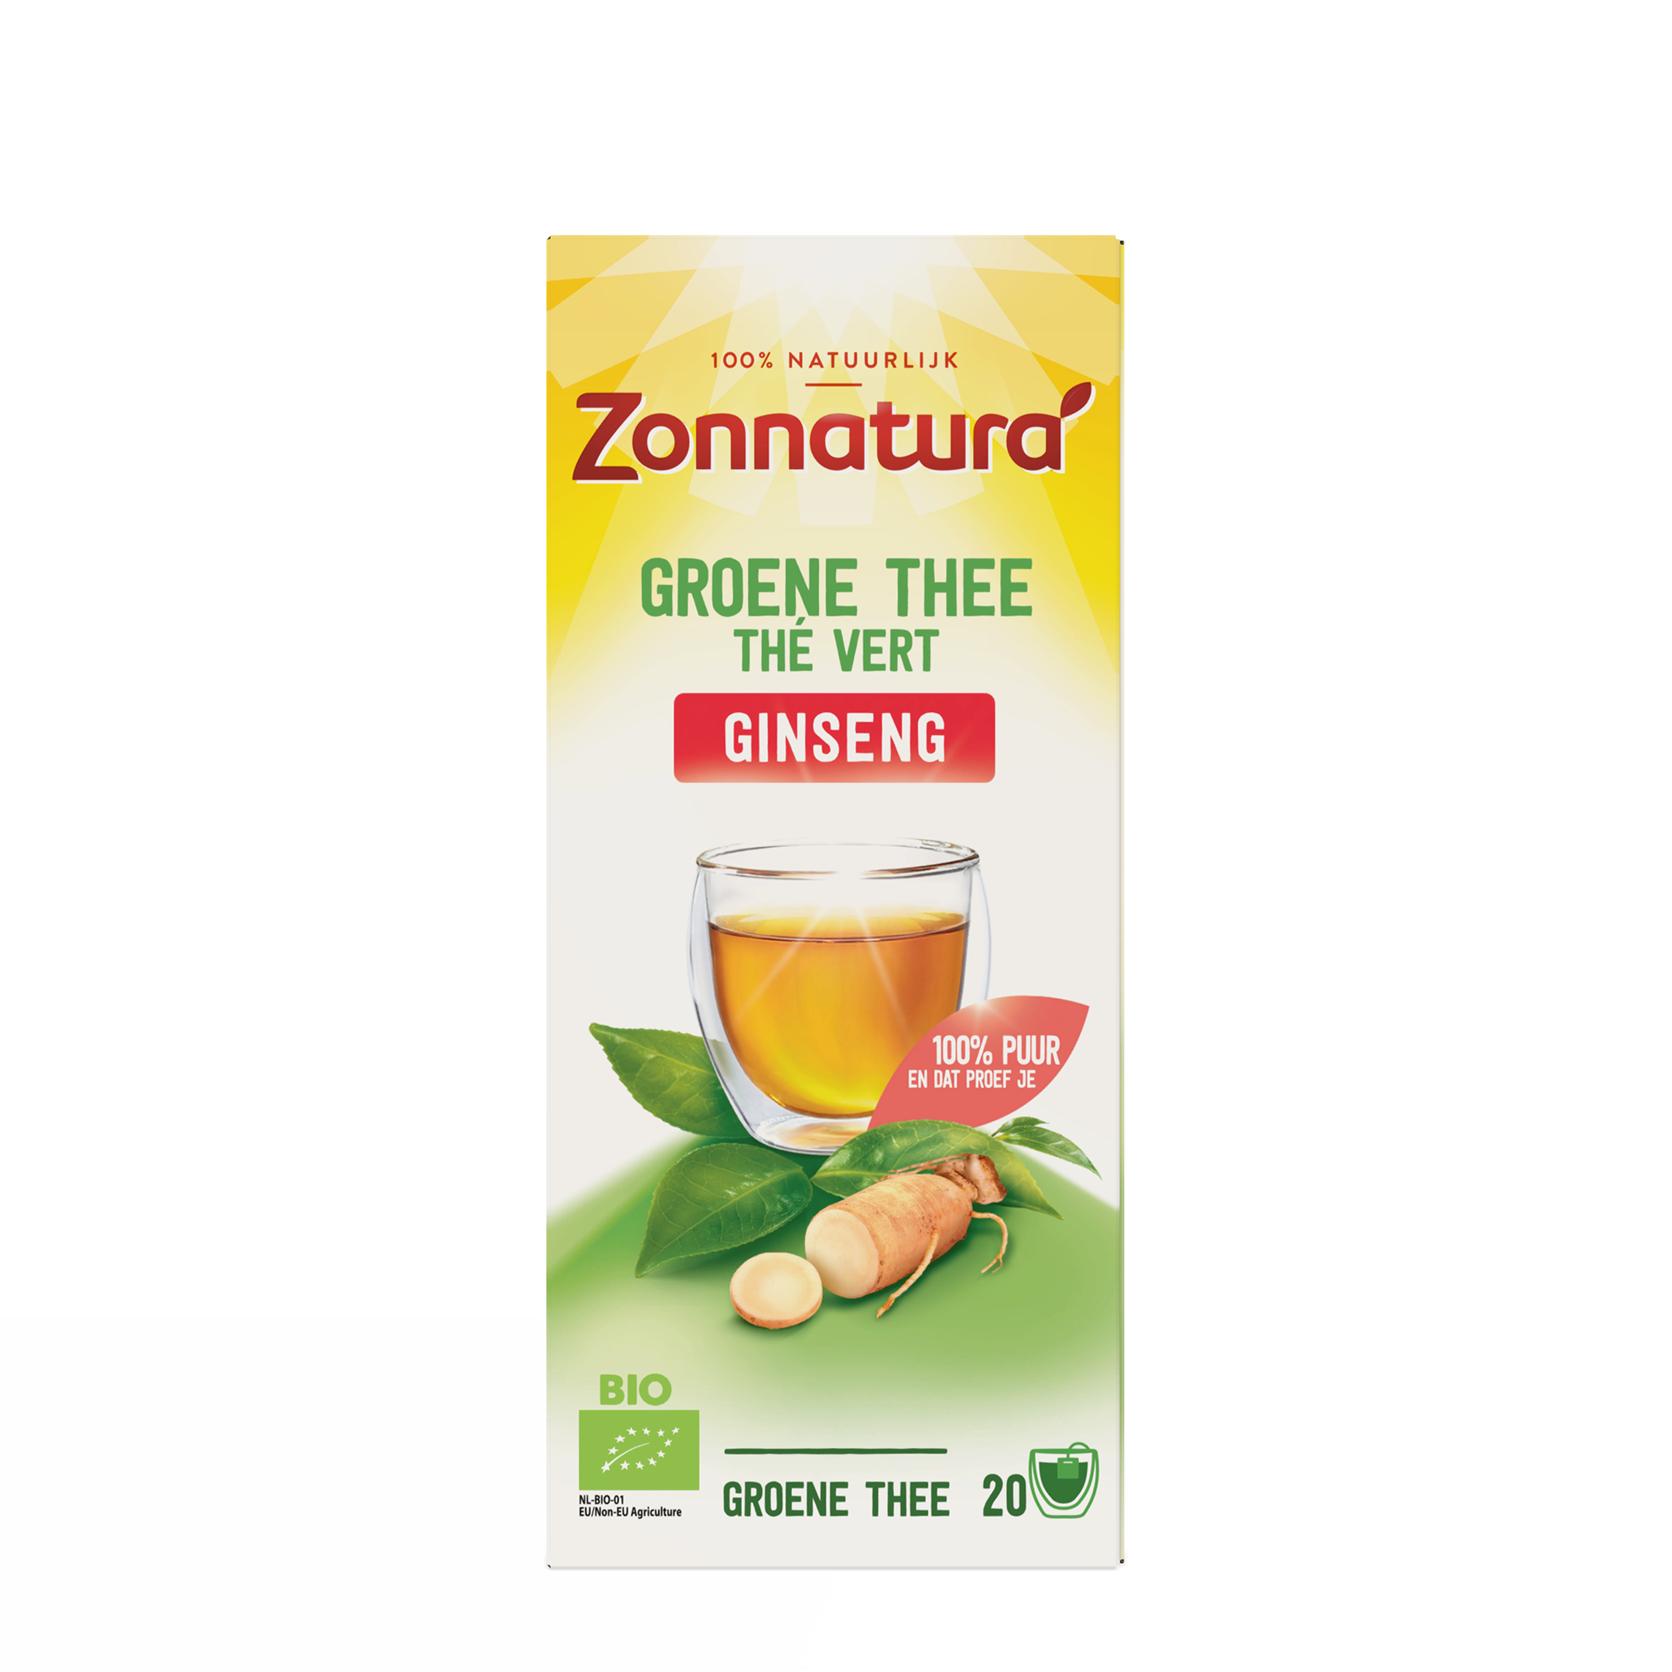 Groene Thee Ginseng